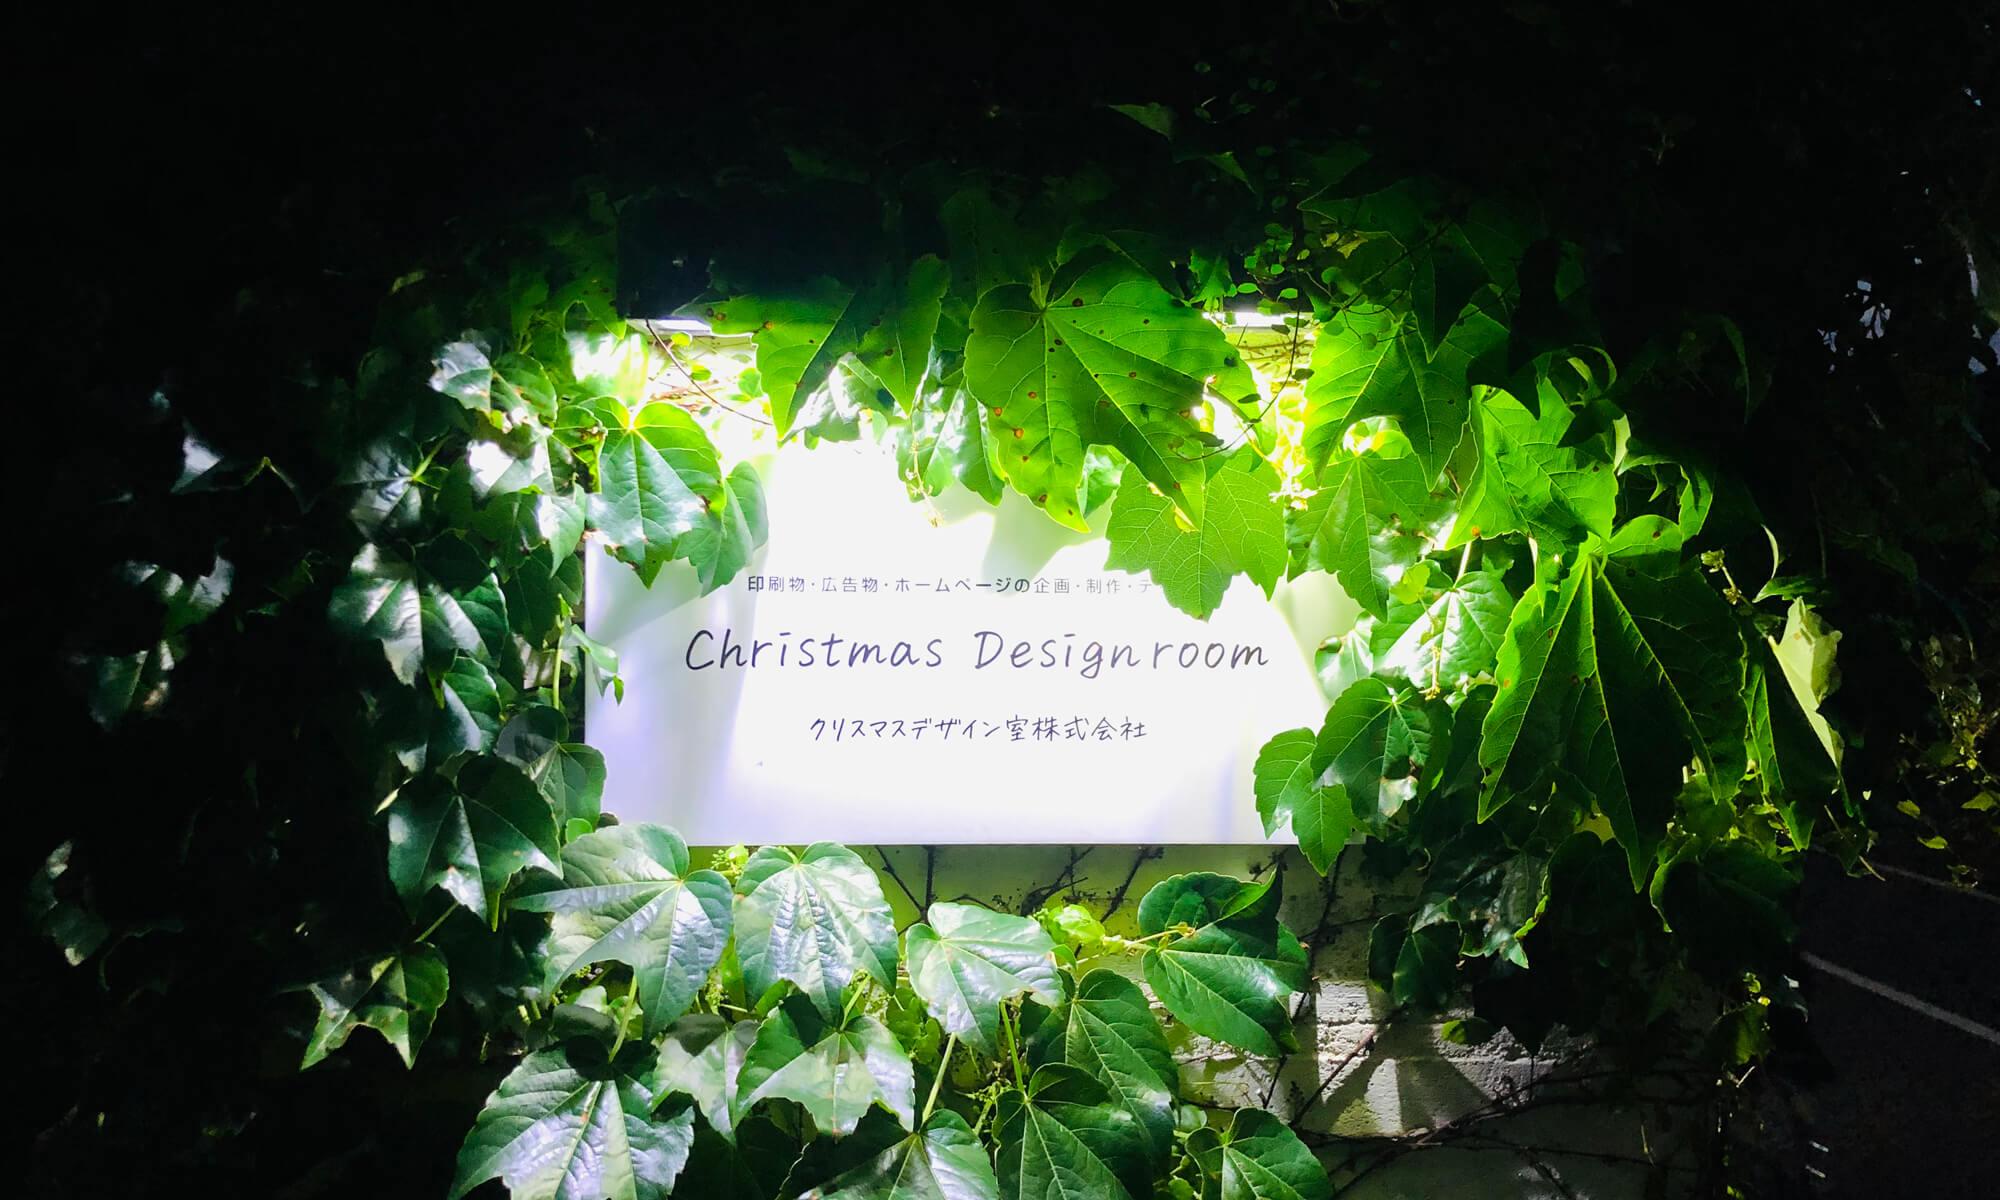 Christmas design room